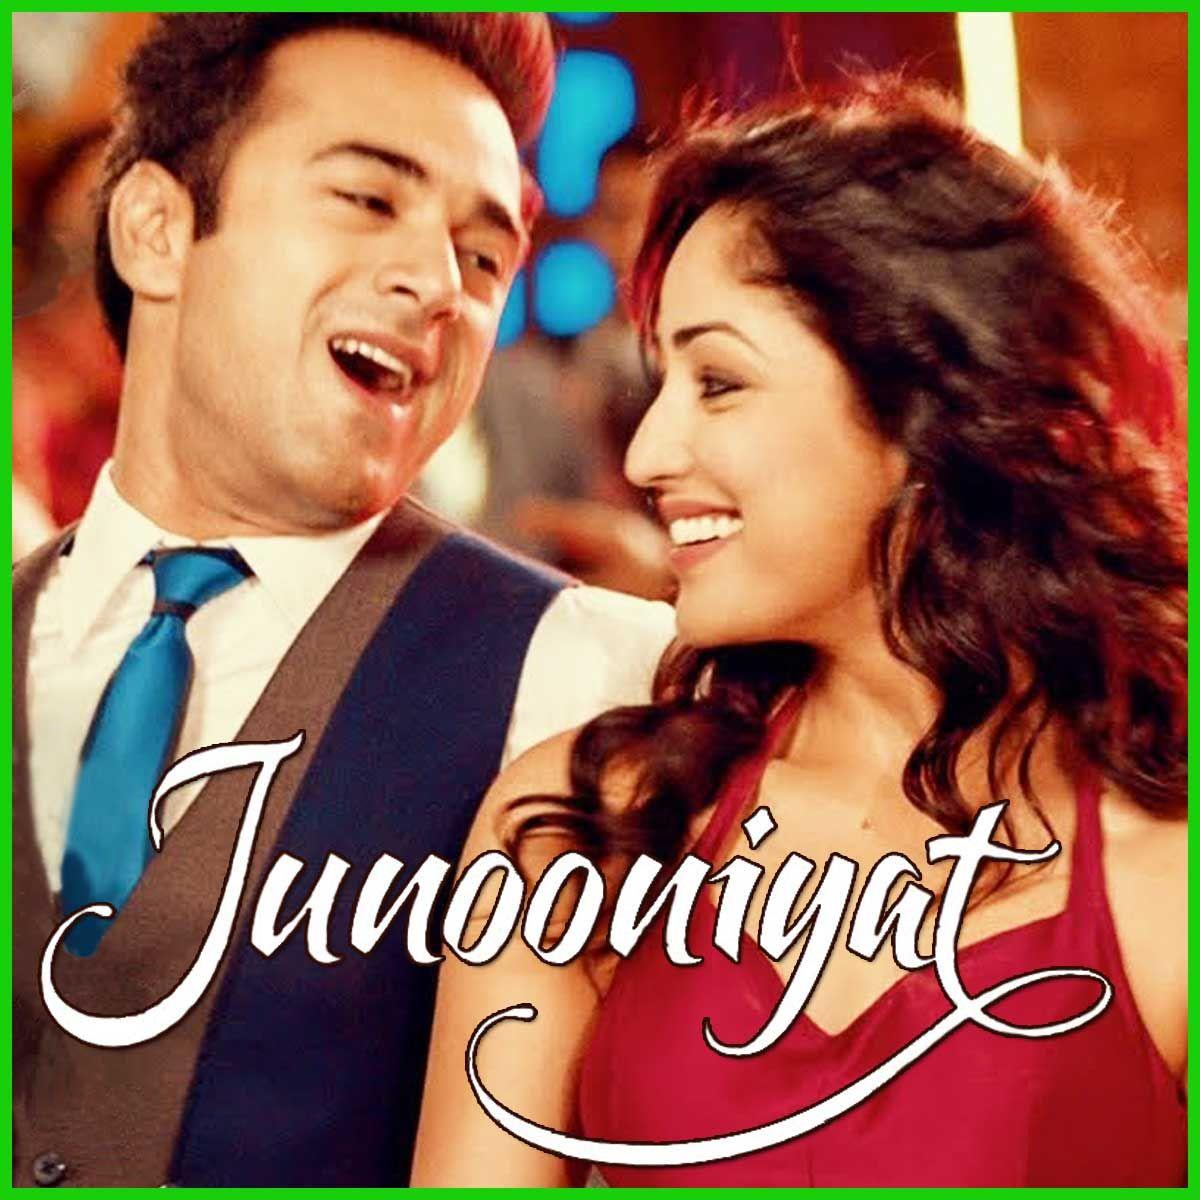 Nachange Saari Raat Video Karaoke With Lyrics Junooniyat Video Karaoke Karaoke Karaoke Songs Bollywood Celebrities